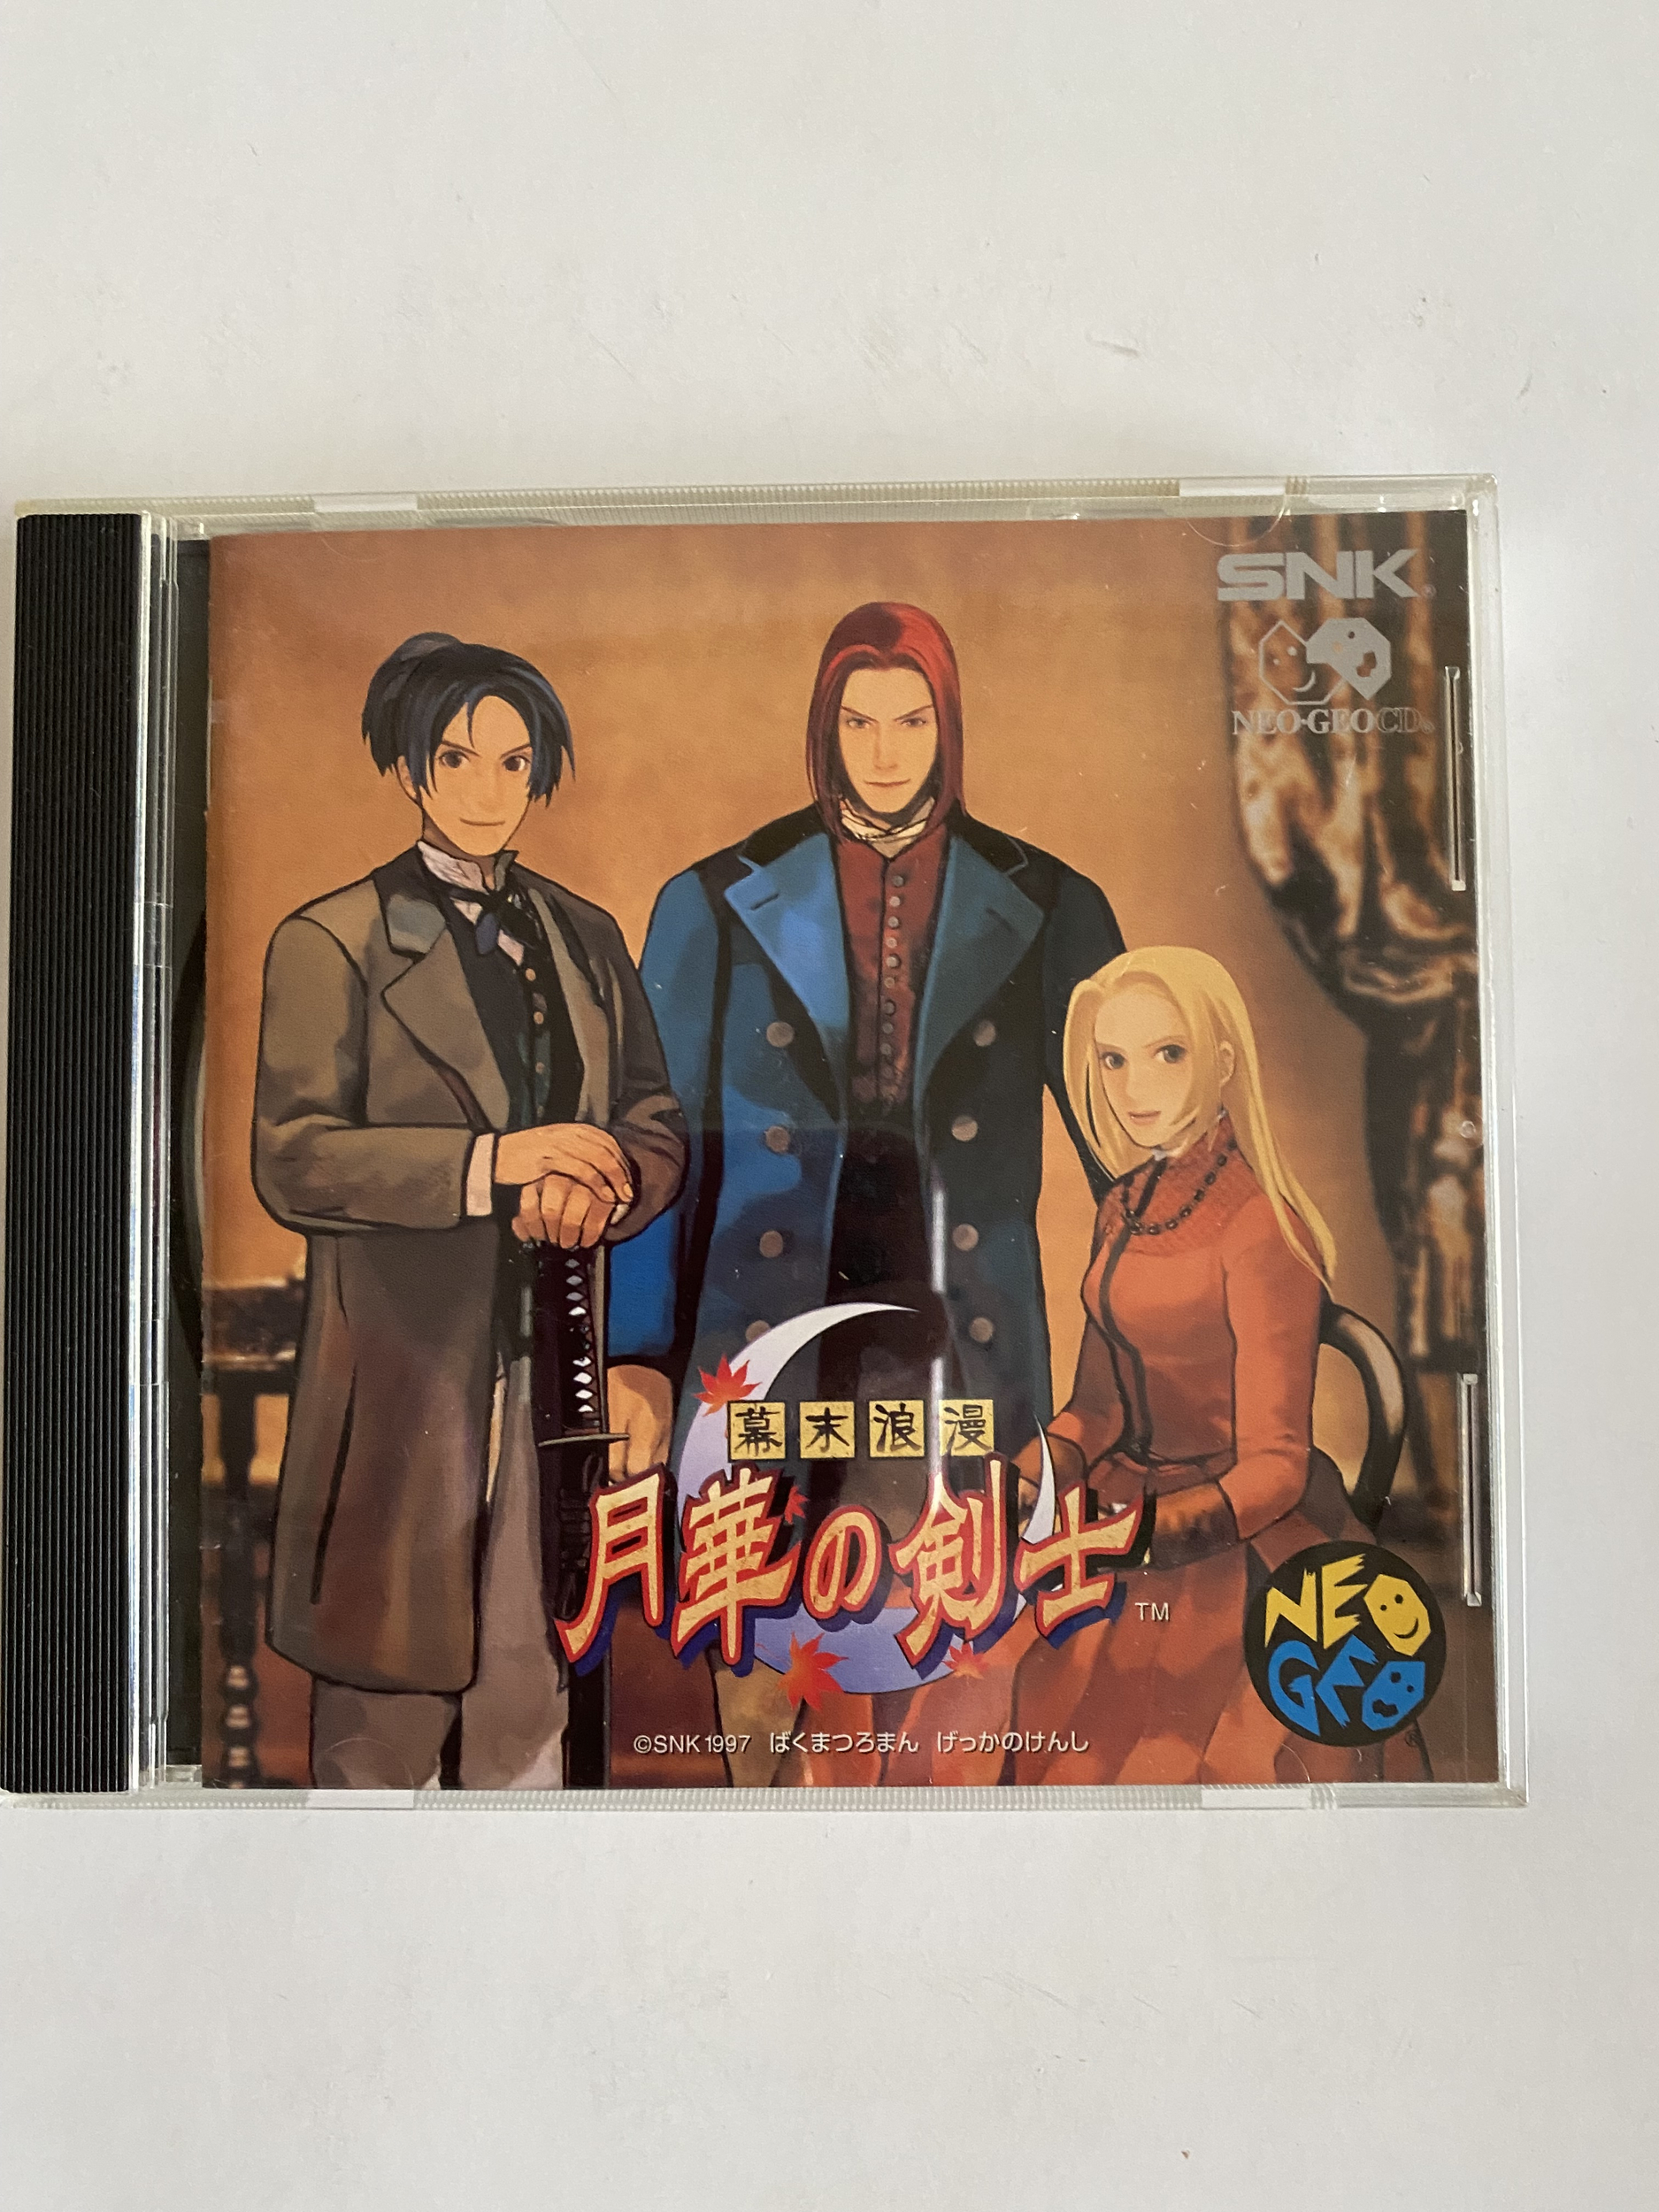 Way of Blade - Neo Geo CD